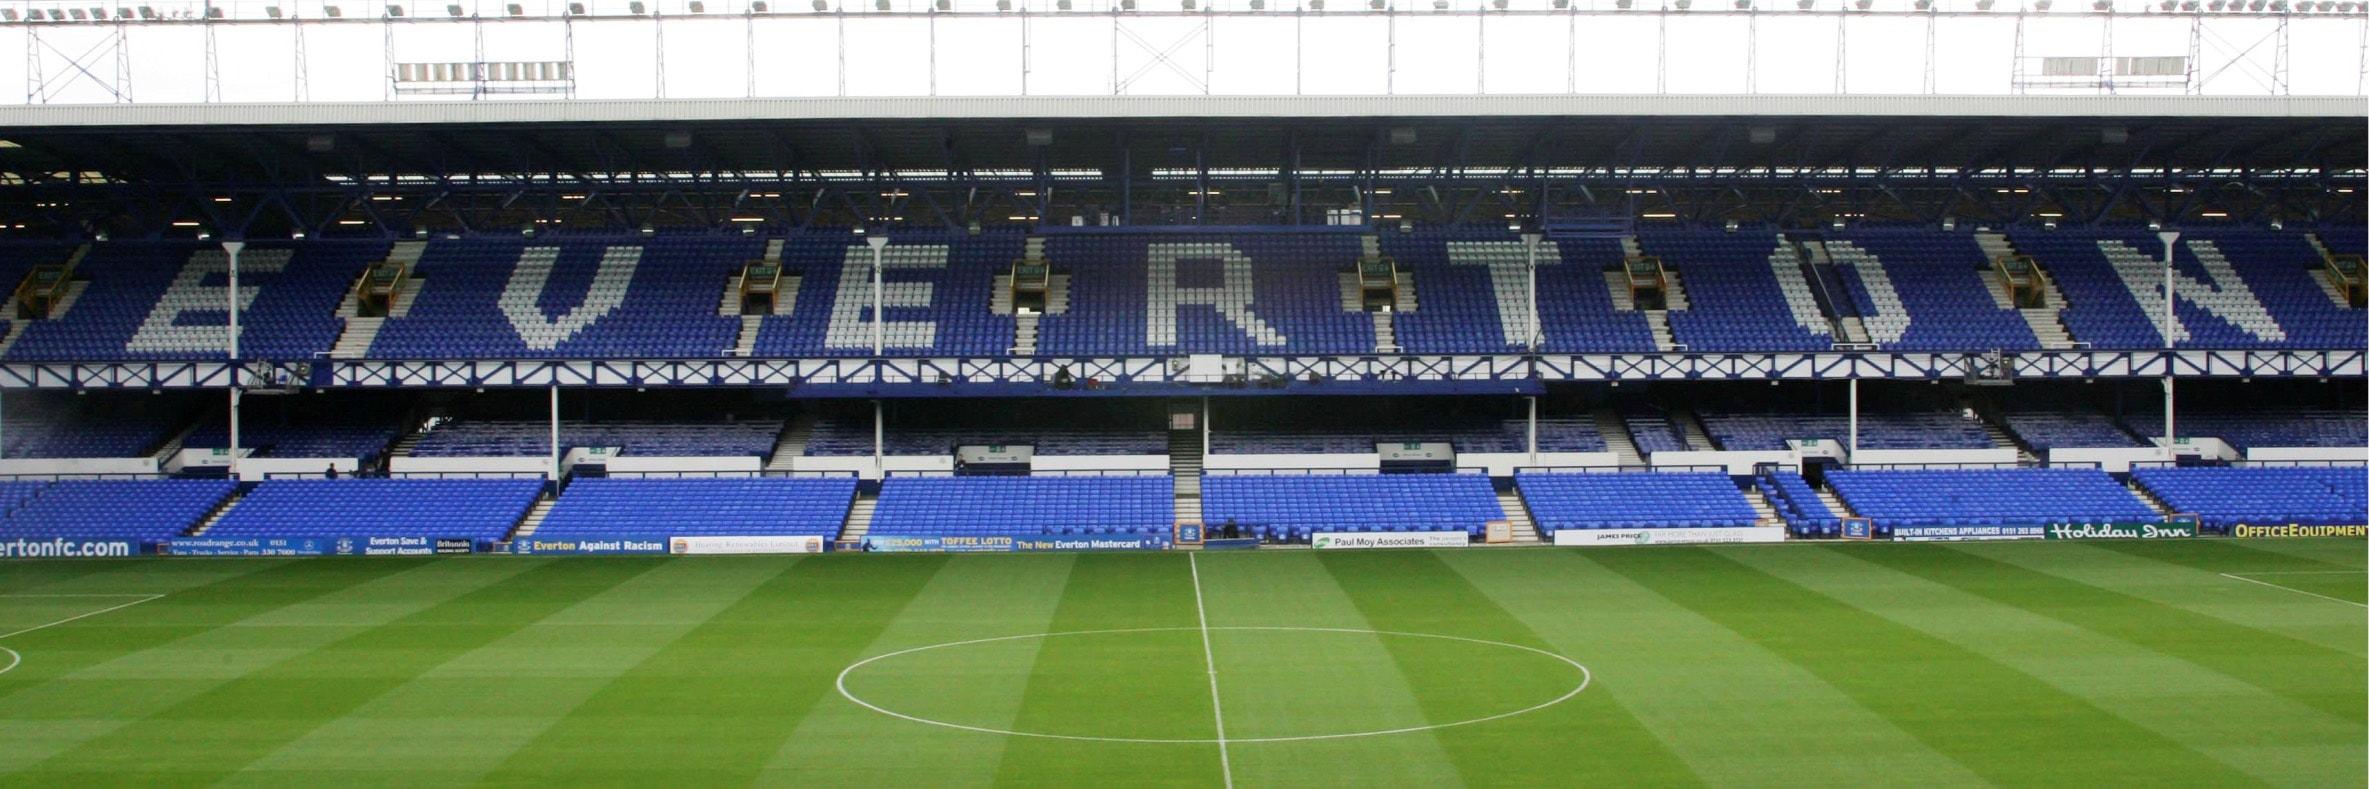 Everton FC - Manchester United, 6 aprilom 0:00